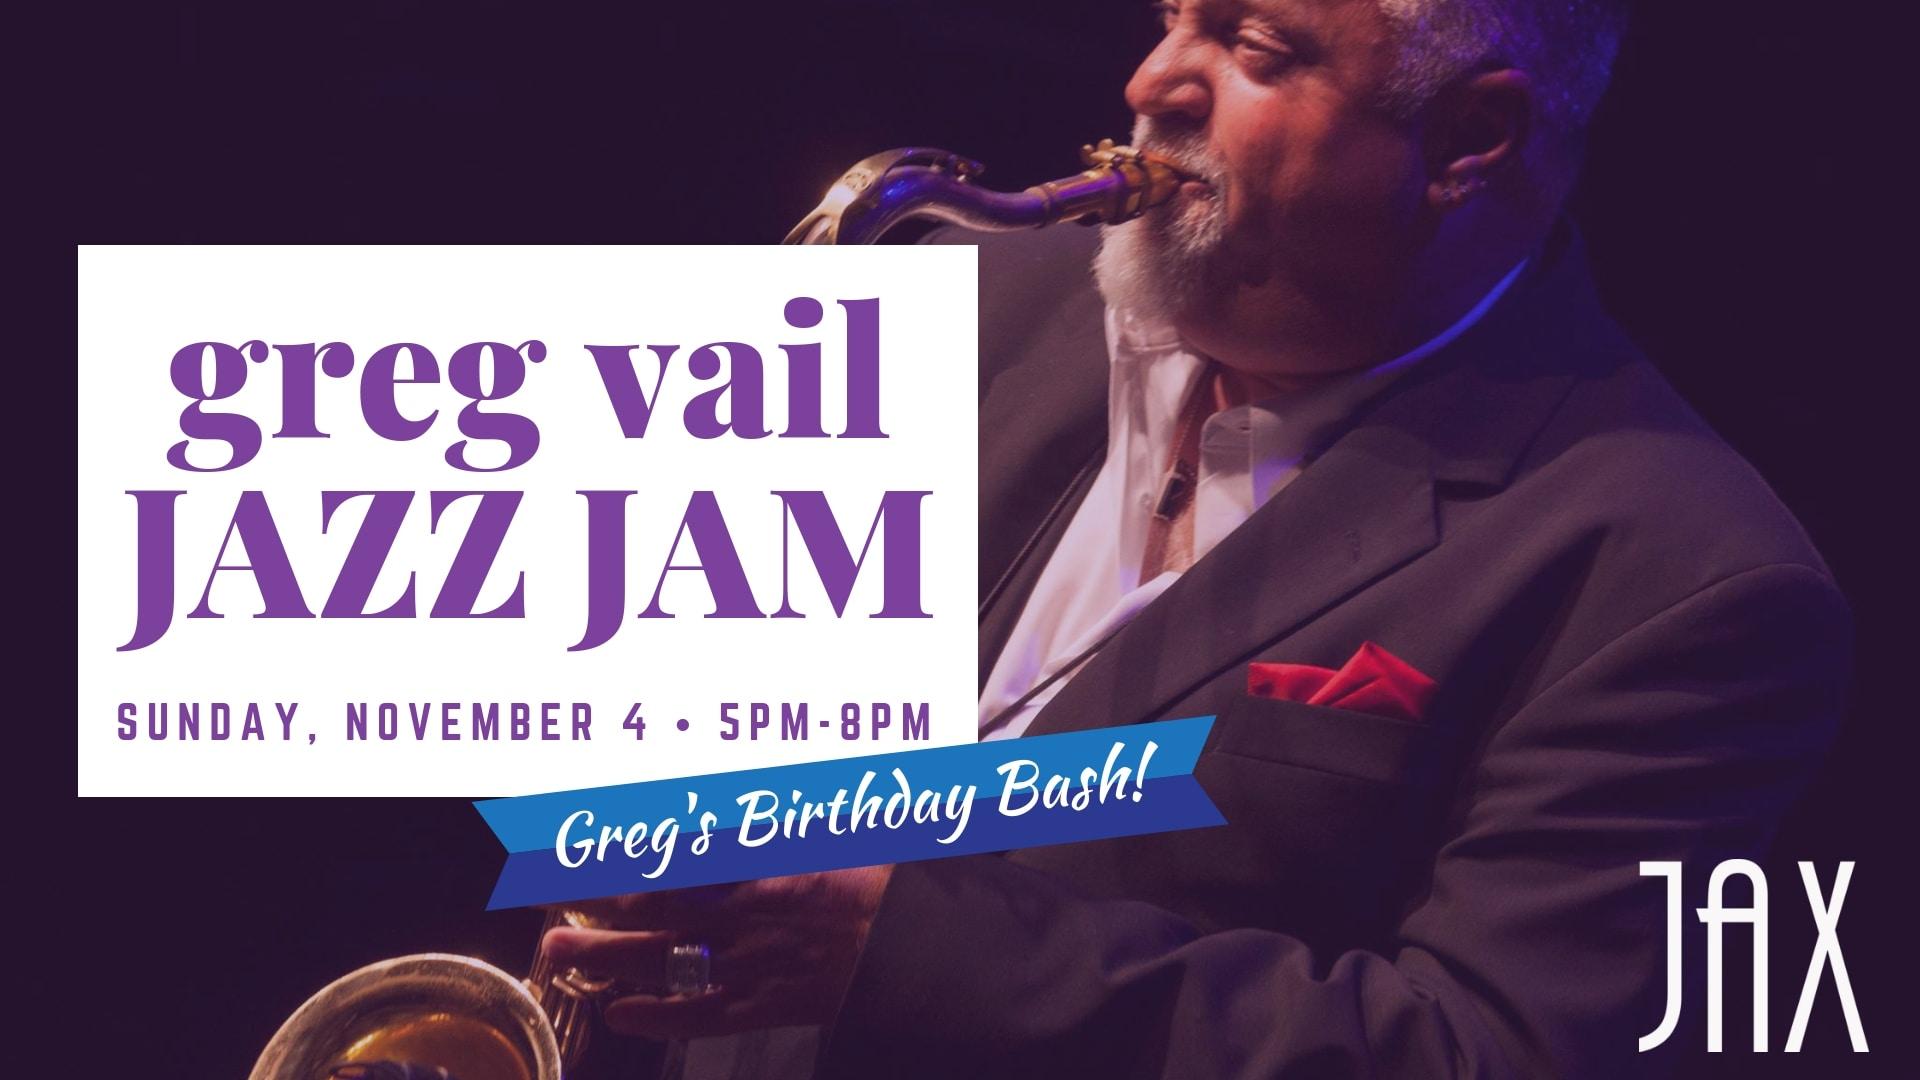 November 4 | GREG VAIL JAZZ JAM